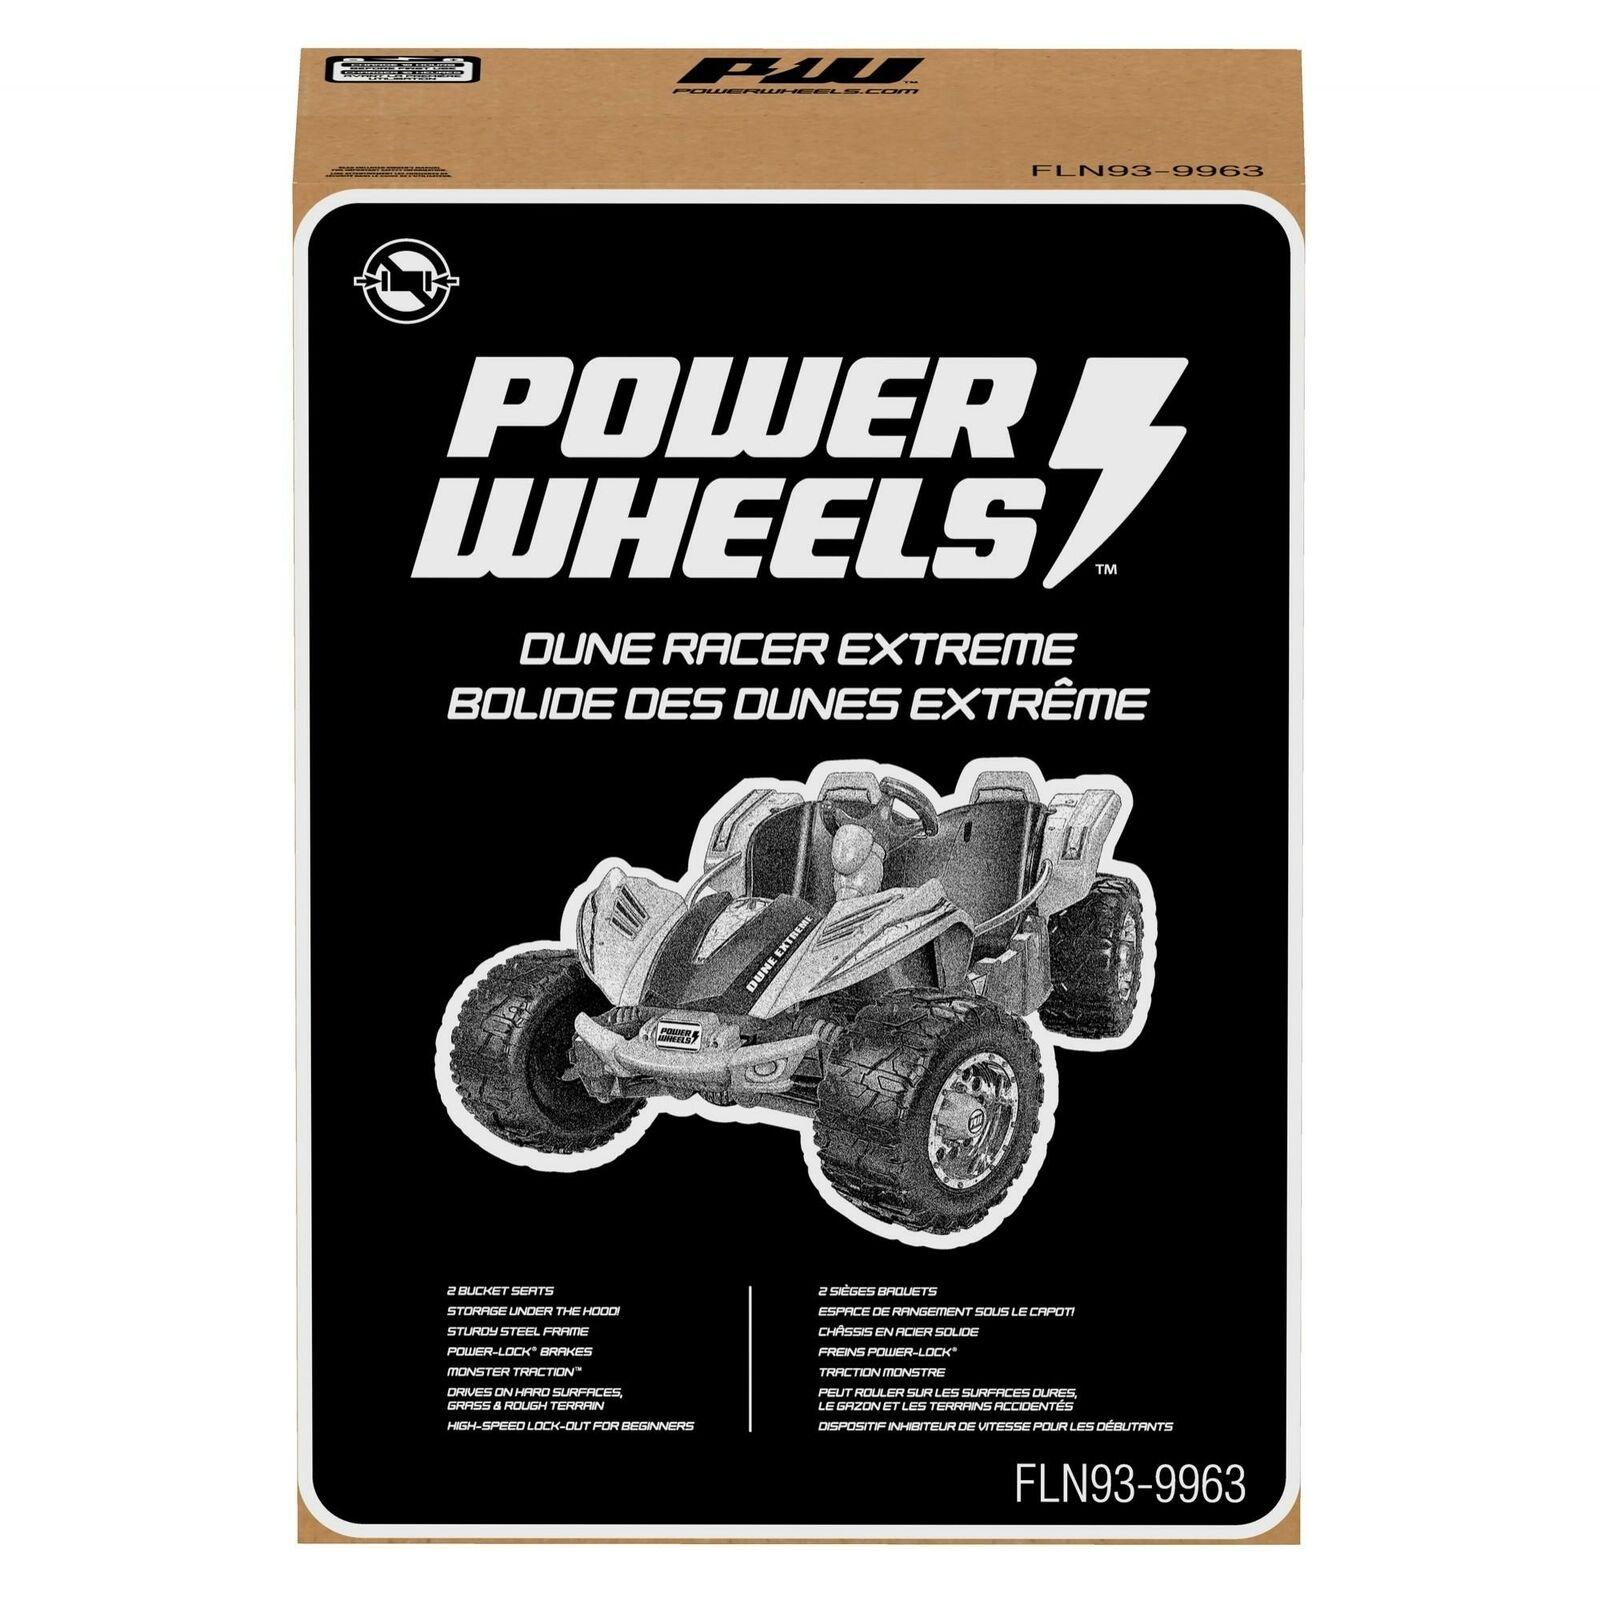 Power Wheels Fln93 Dune Racer Extreme Purple Ride On Vehicle For Sale Online Ebay